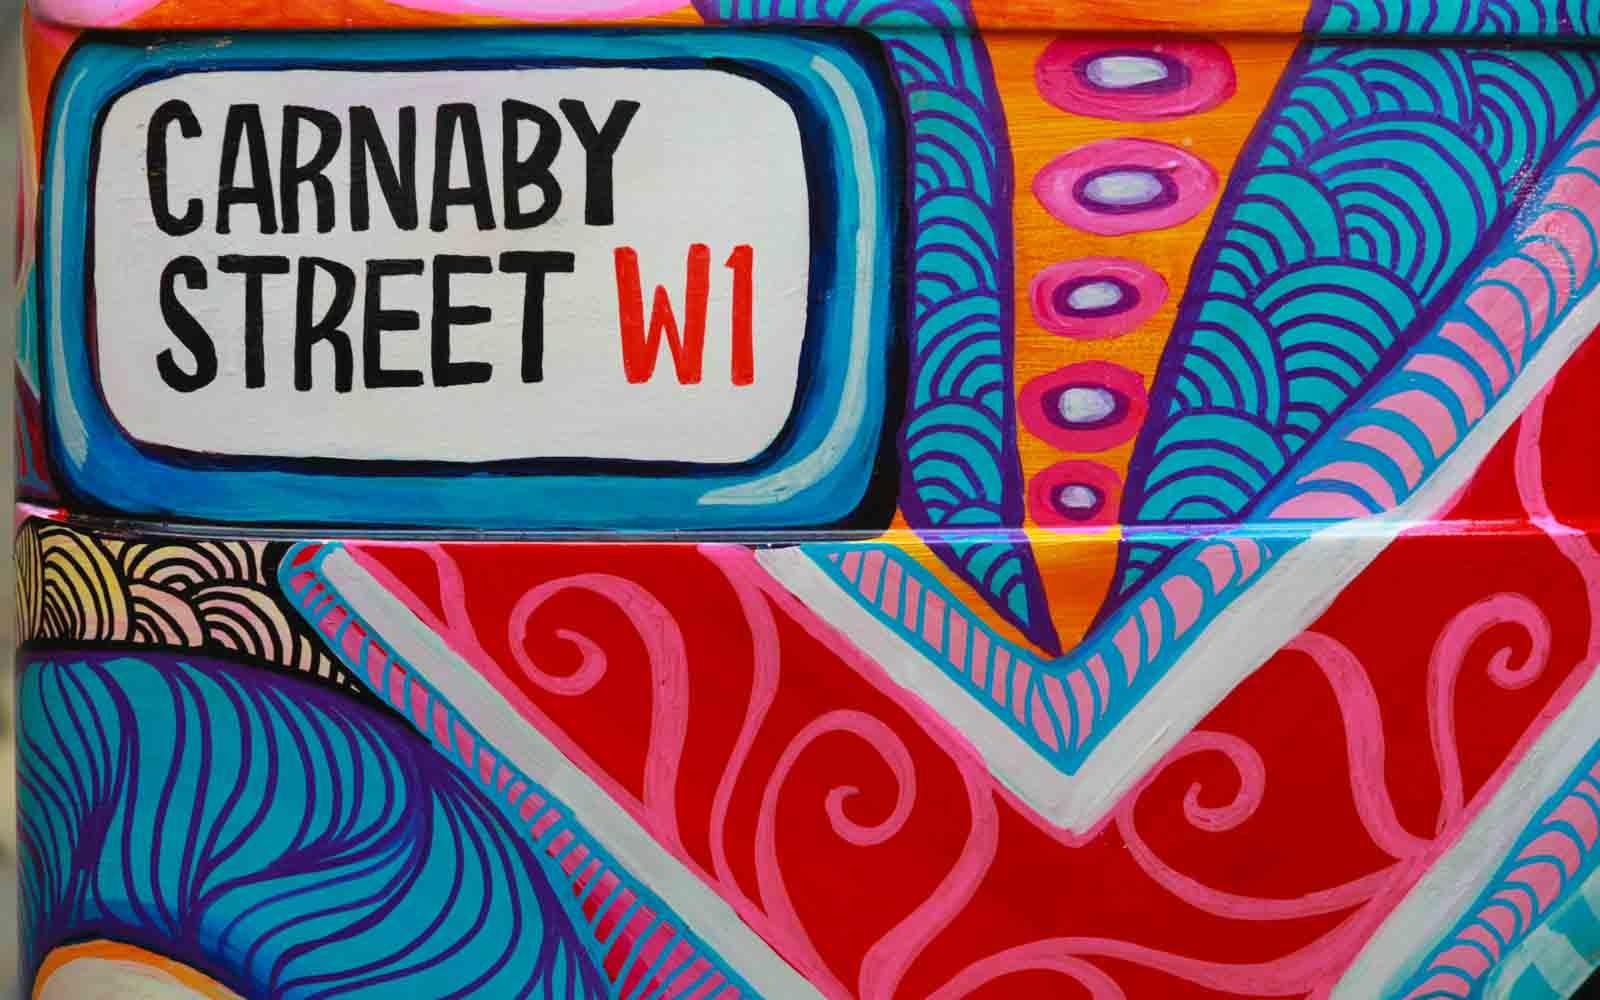 carnaby-stree-jean-philippe-unsplash